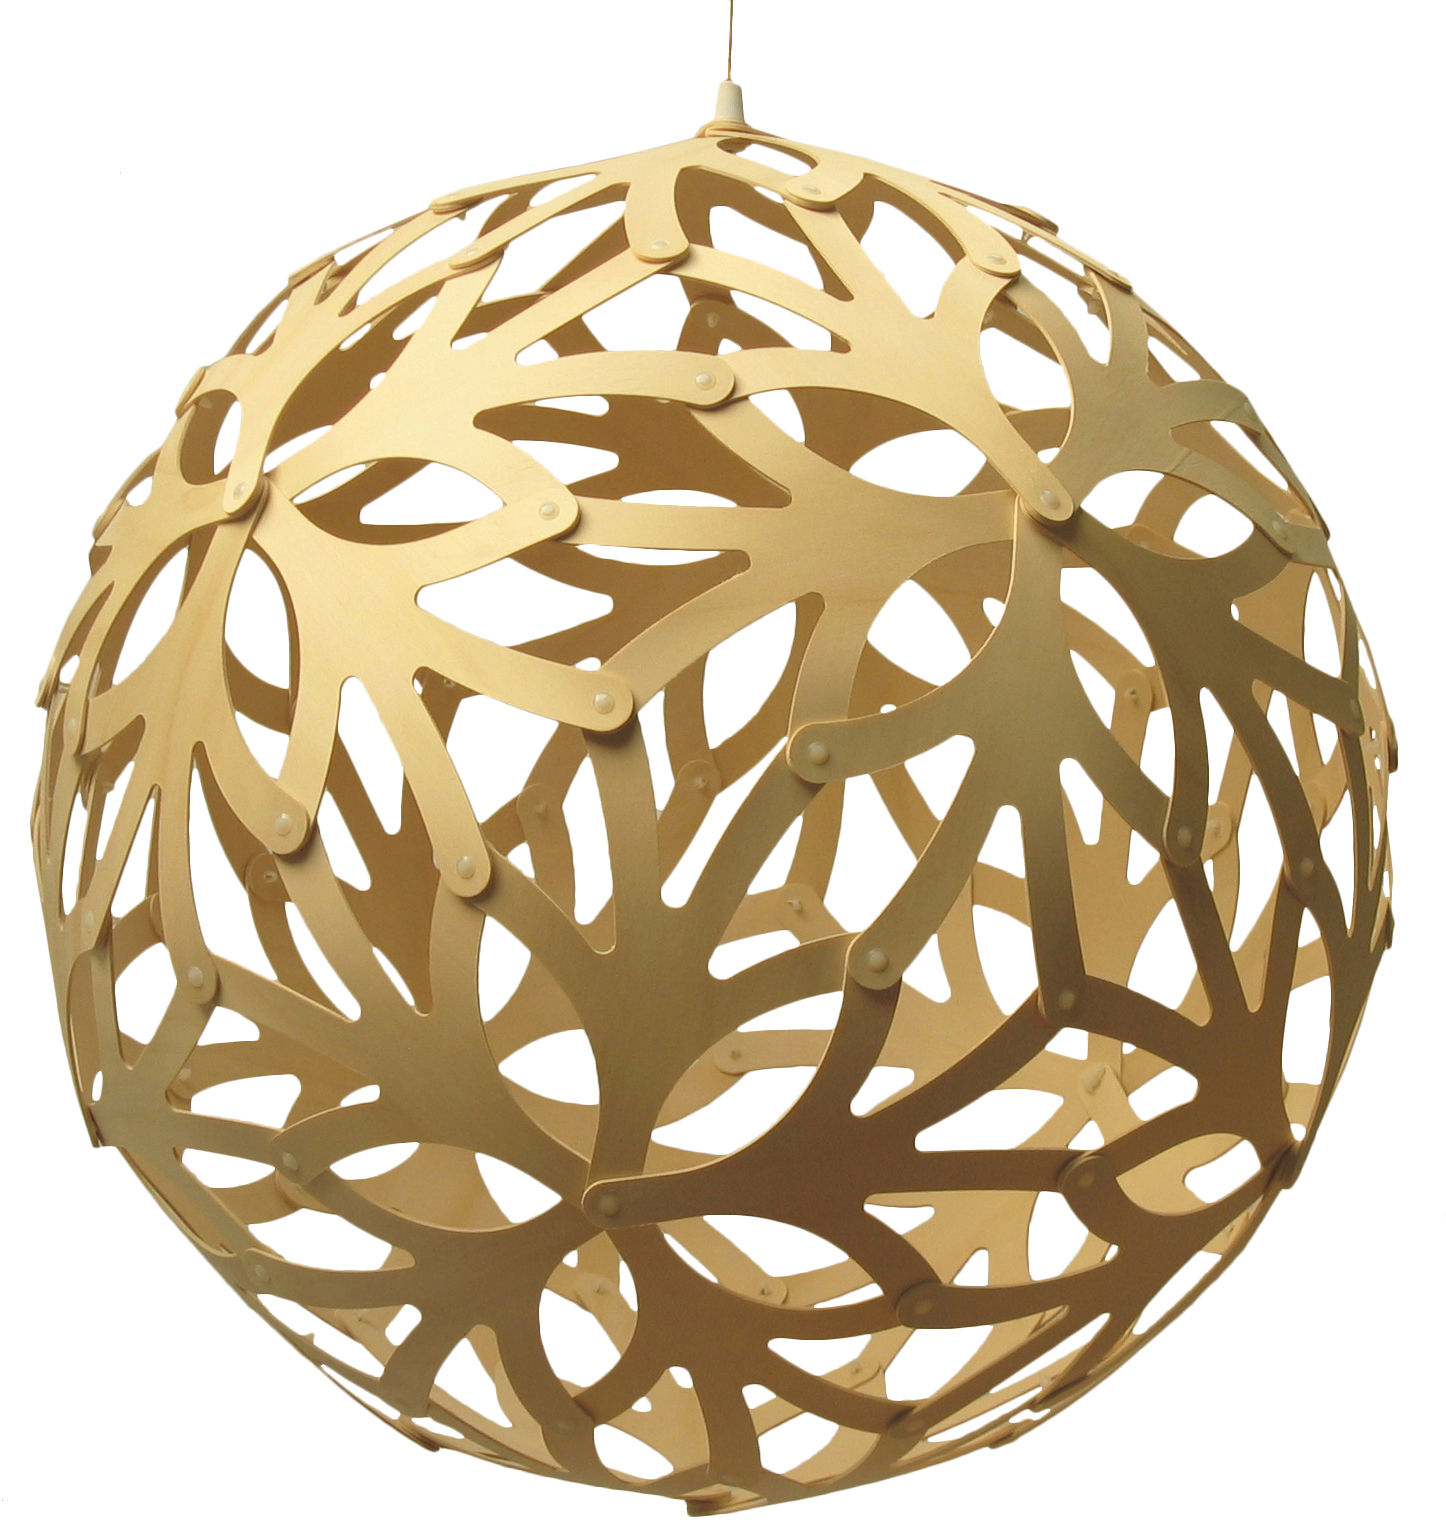 Lighting - Pendant Lighting - Floral Pendant - / Ø 60 cm – Natural wood by David Trubridge - Natural wood - Pine plywood